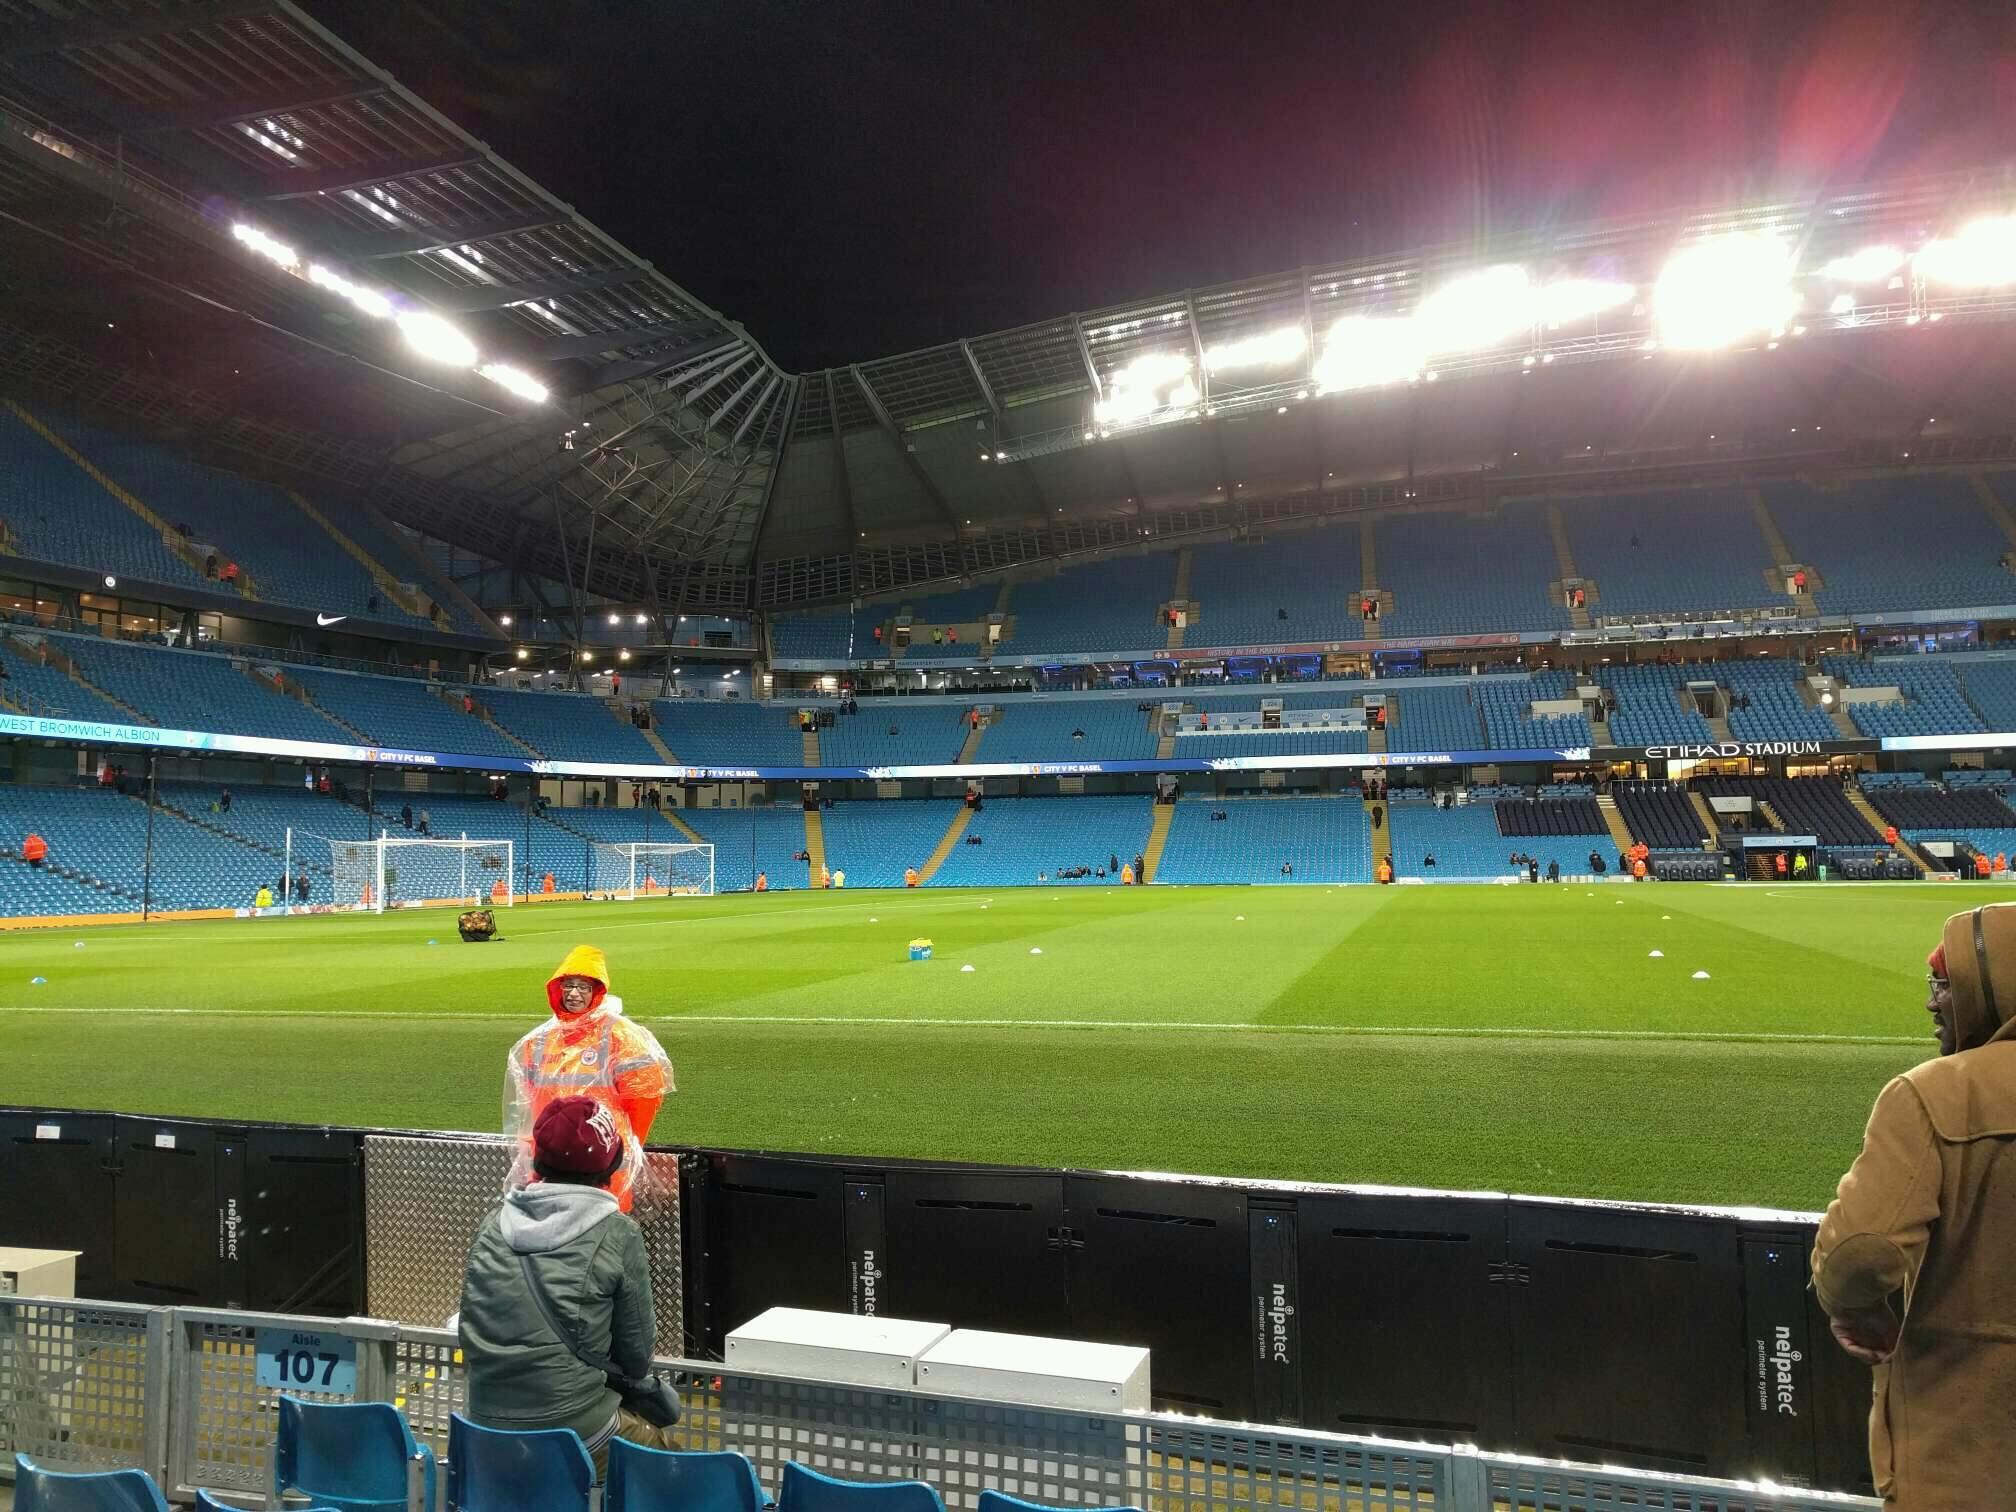 Etihad Stadium (Manchester) Section 106 Row c Seat 149